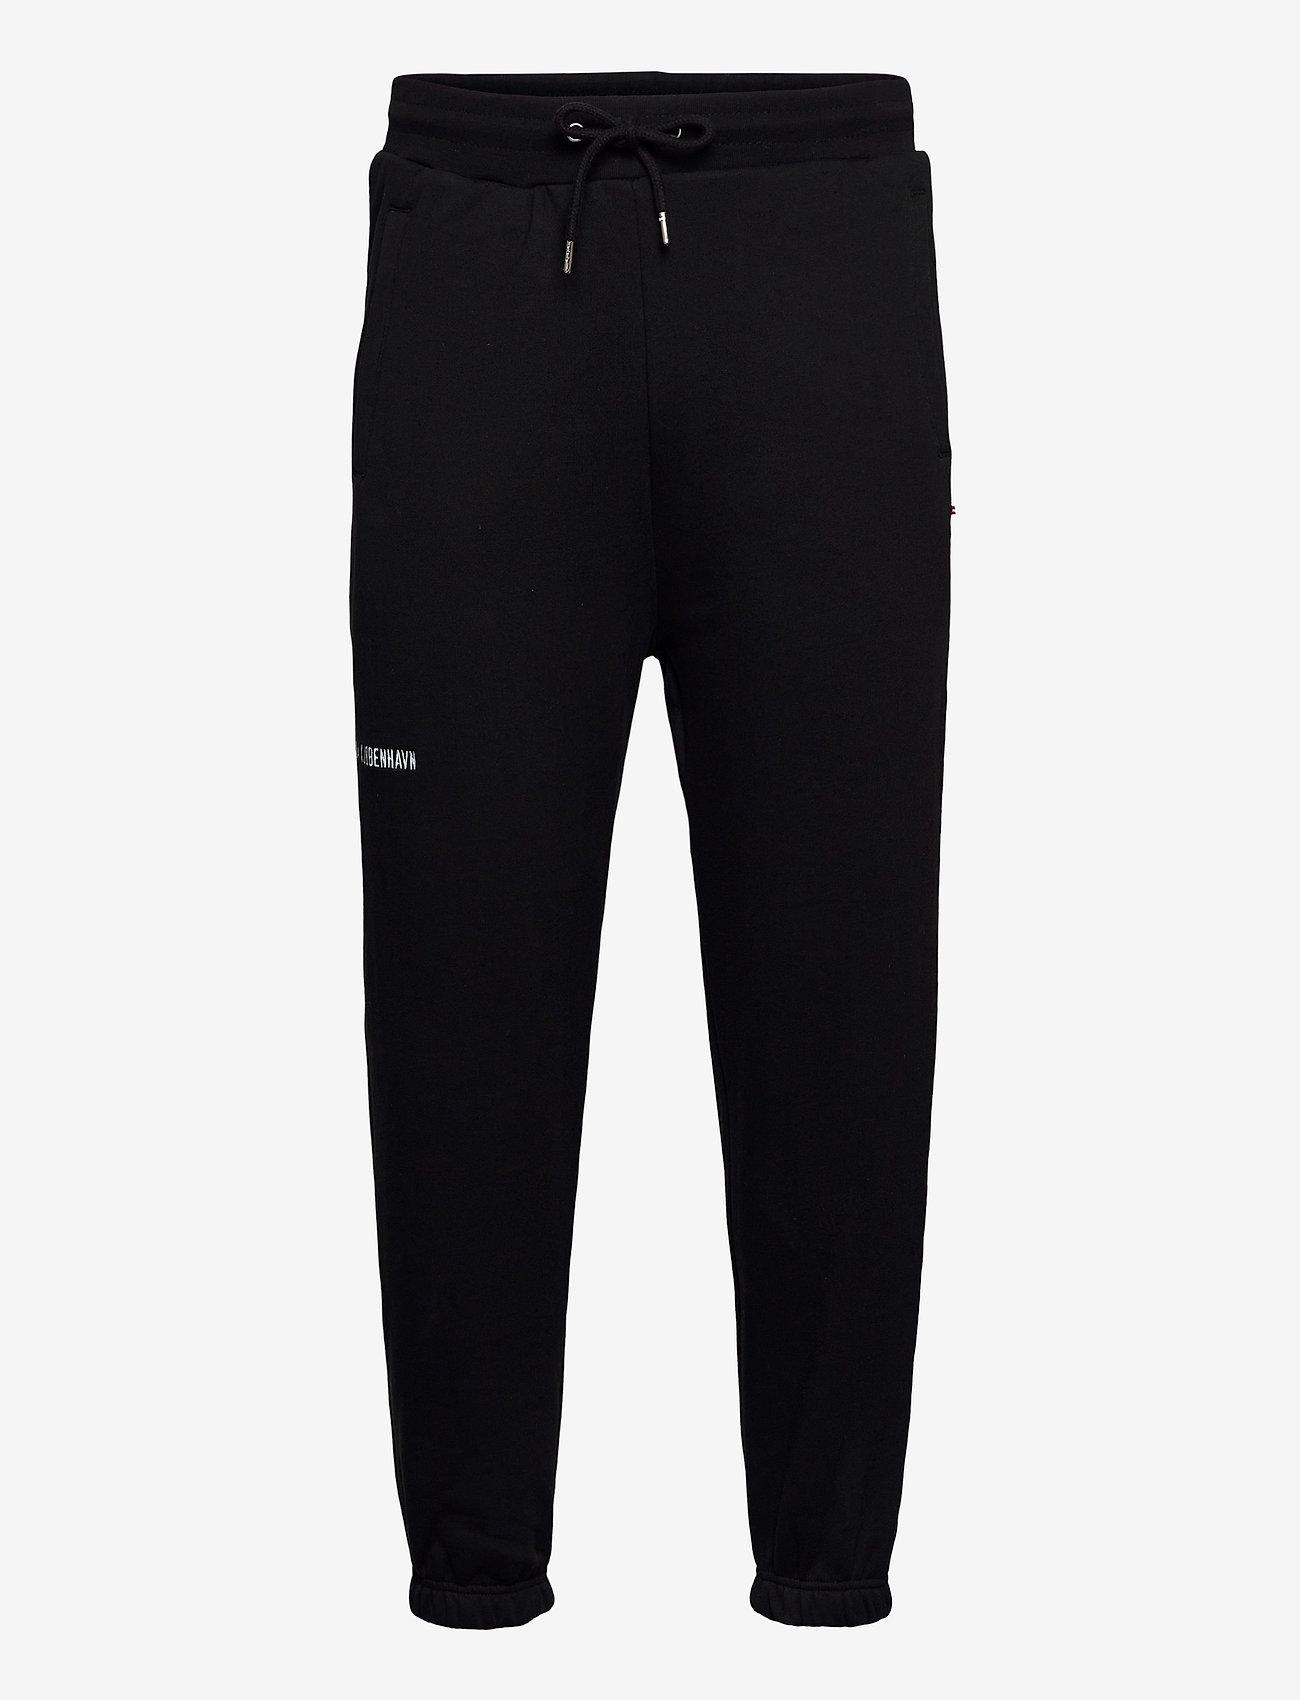 HAN Kjøbenhavn - Sweat Pants - kleding - black logo - 0